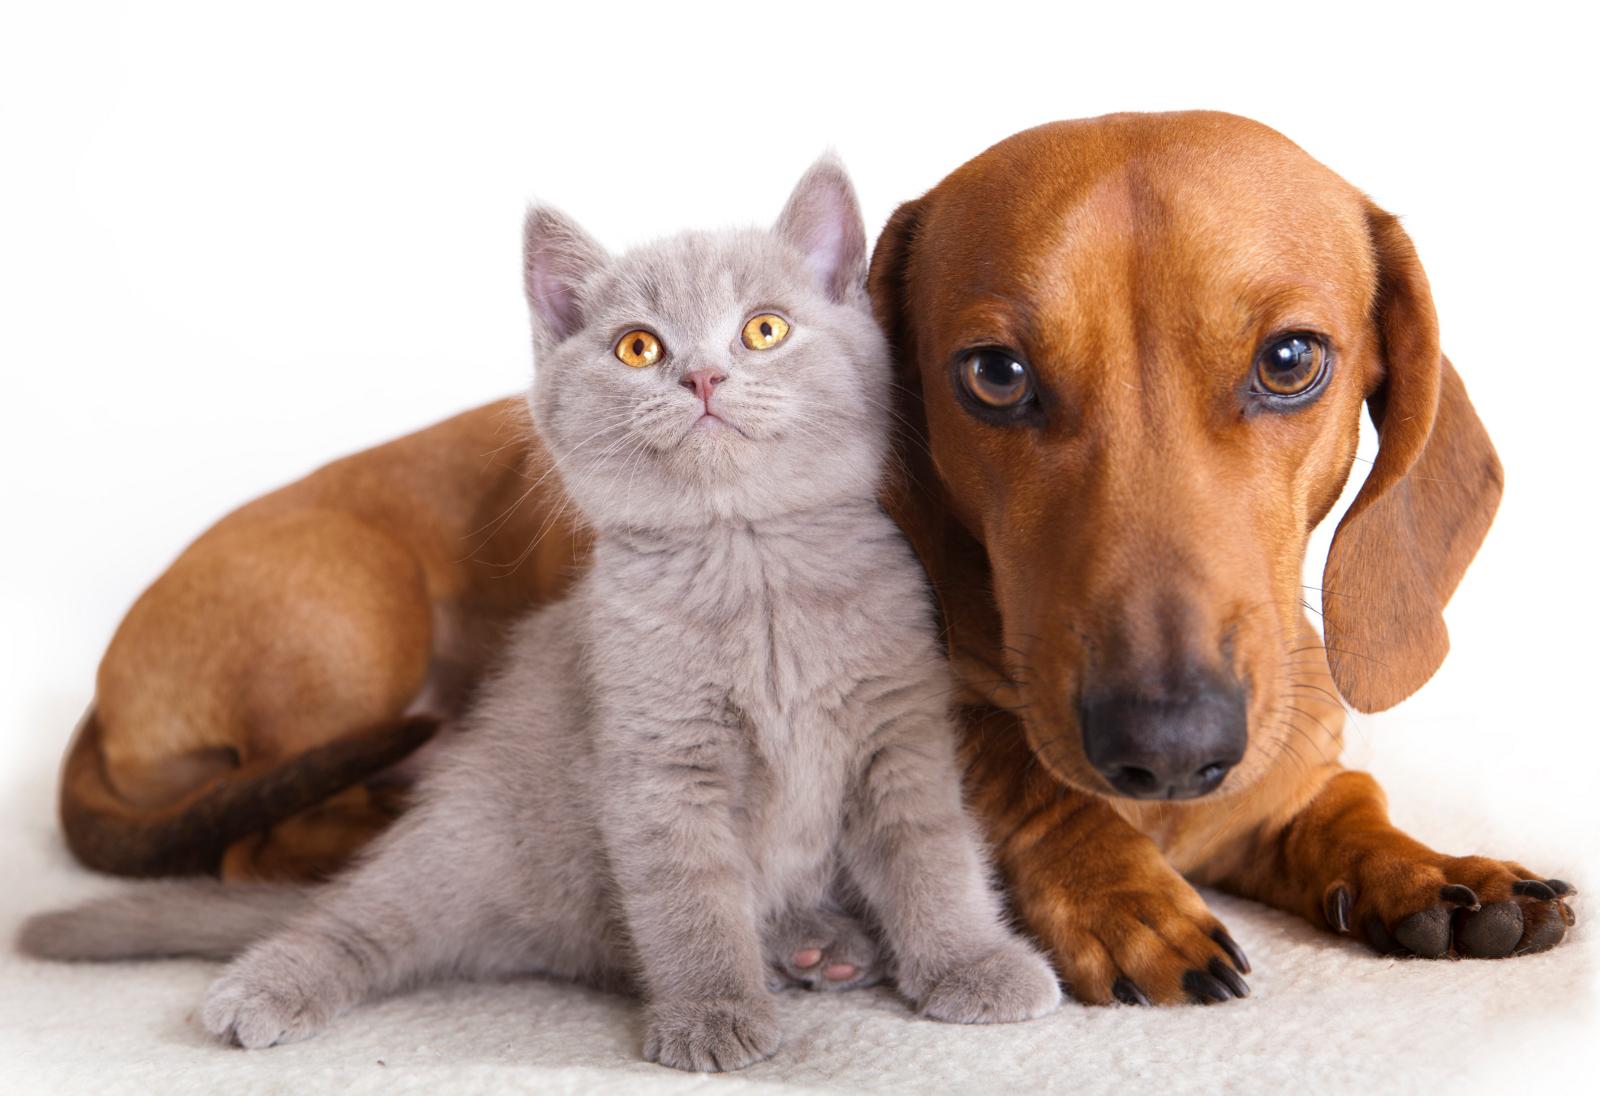 Beneficios-de-tener-una-mascota-en-la-familia-2